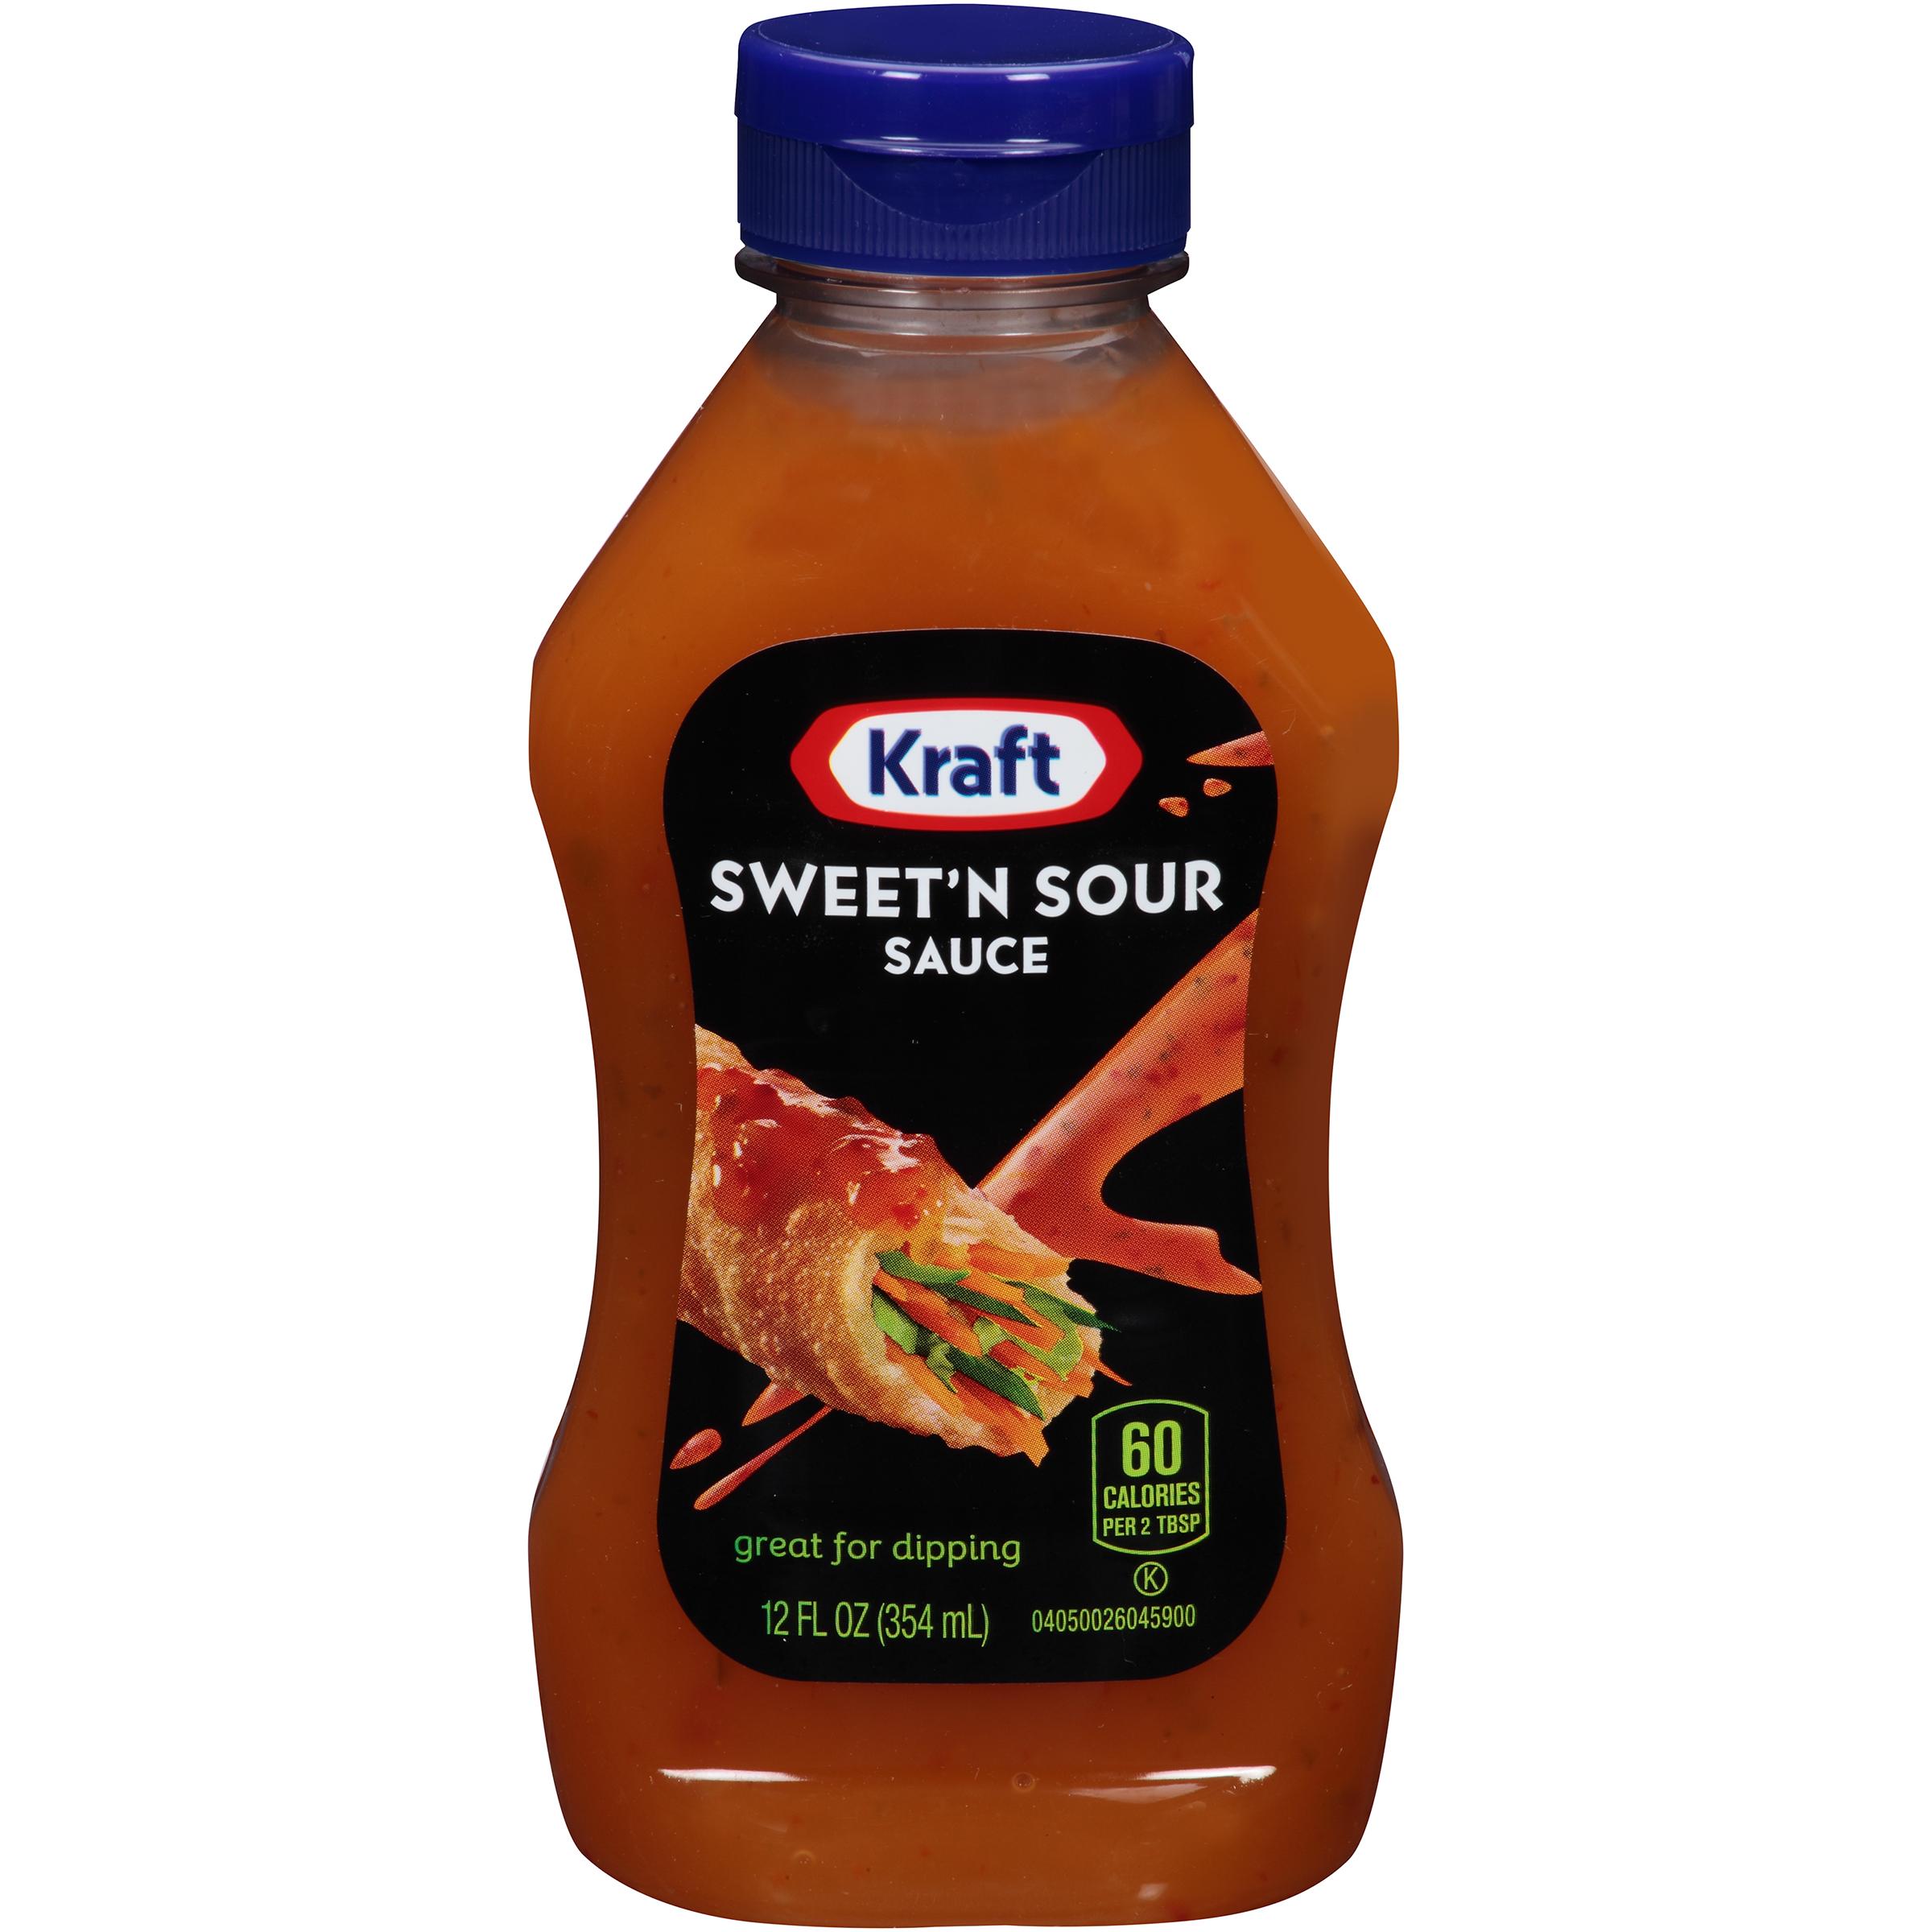 sweet-and-sour-sauce incinta